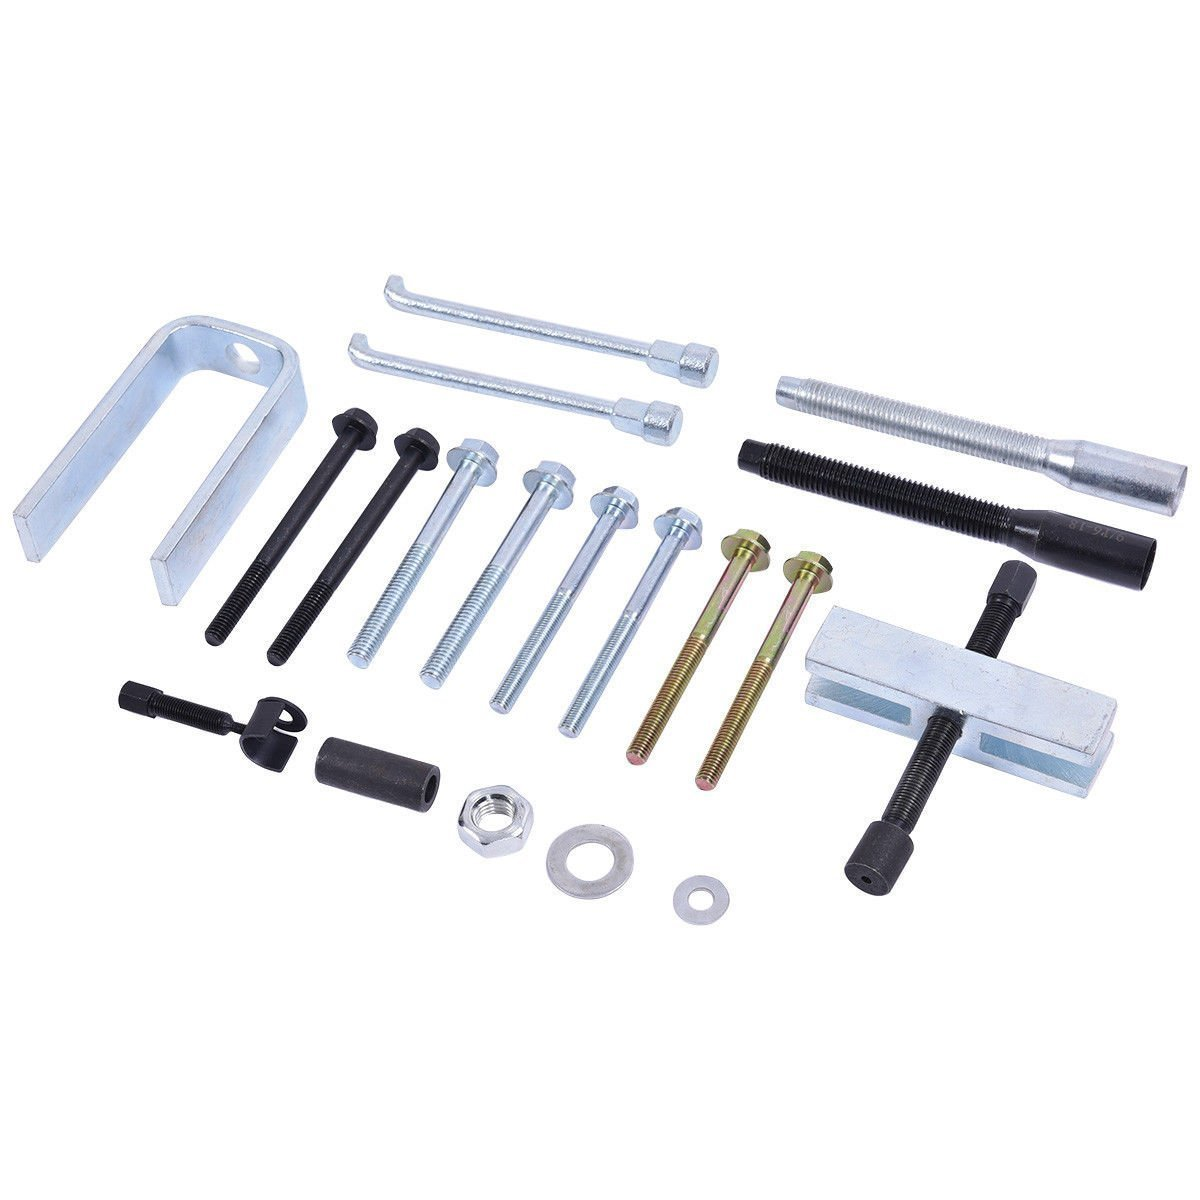 Goplus 19 Pcs Steering Wheel Remover//Lock Plate Compressor Set